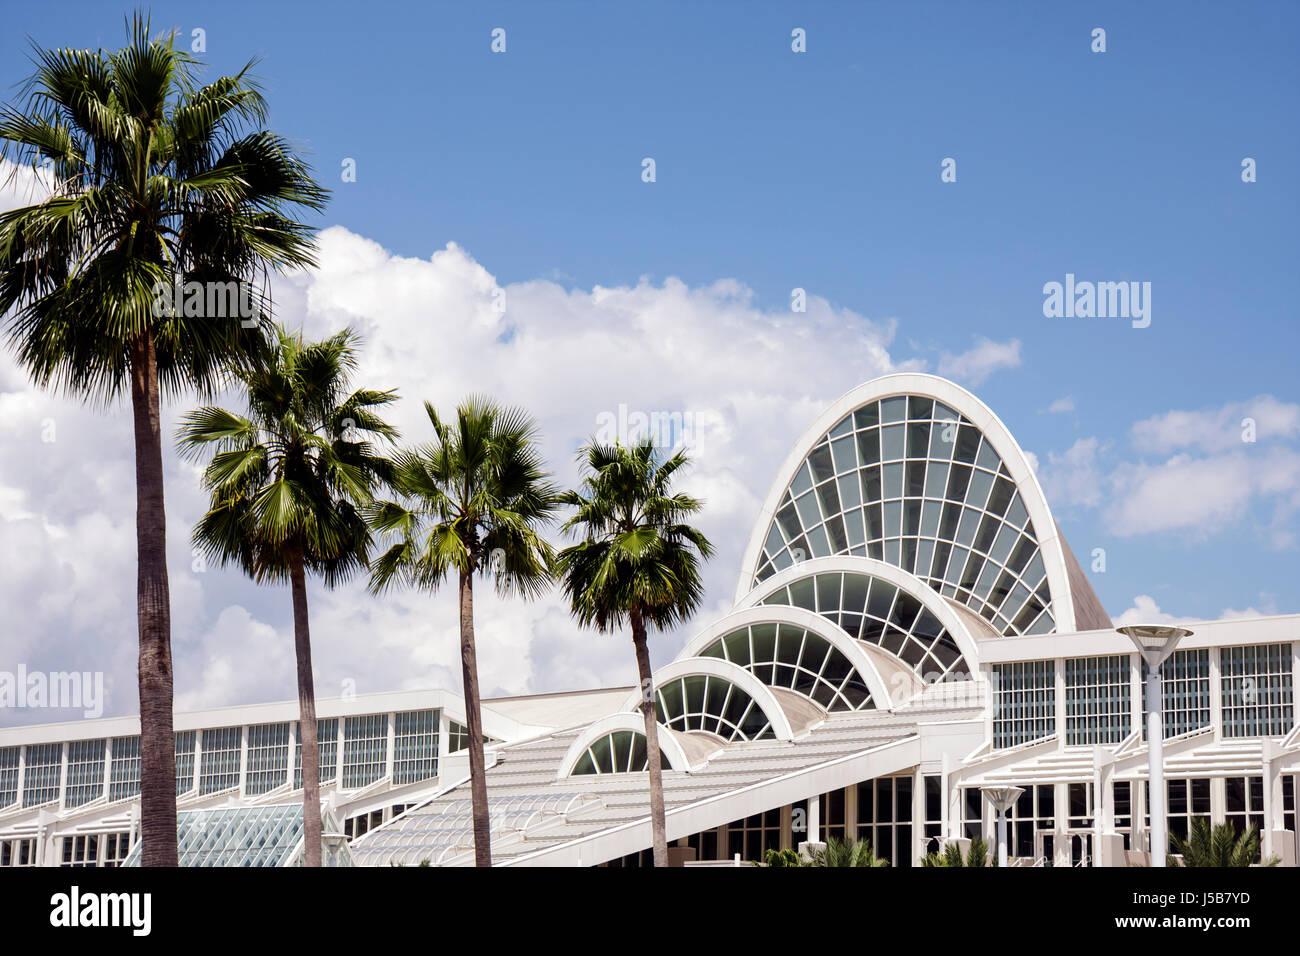 Modern Architecture Orlando orlando florida orange county convention center centre arches